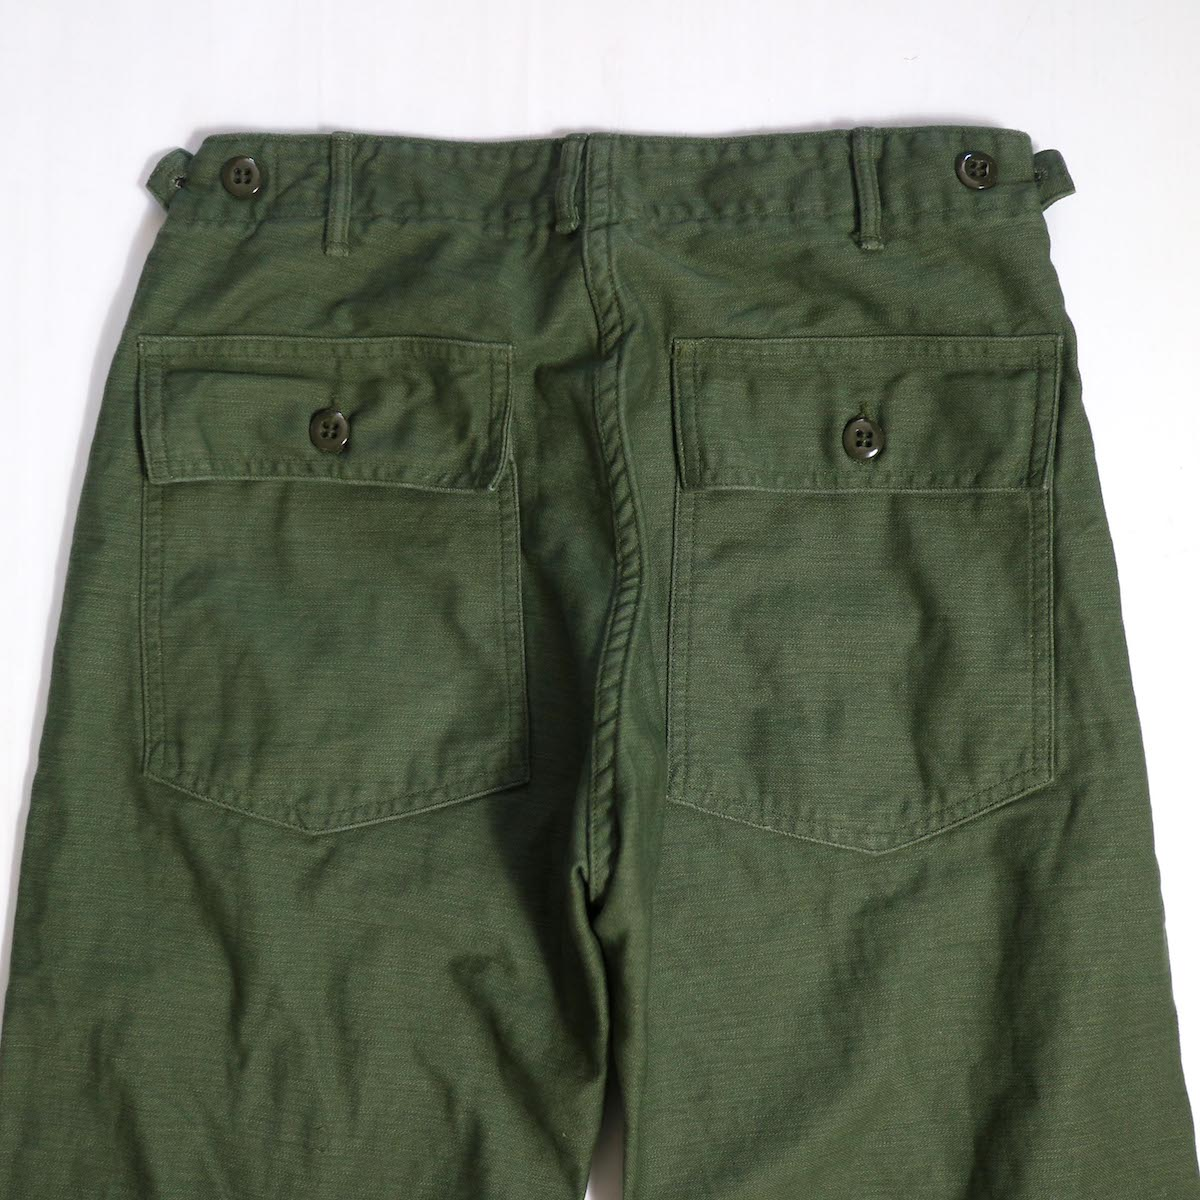 orSlow / SLIM FIT FATIGUE PANTS バックポケット